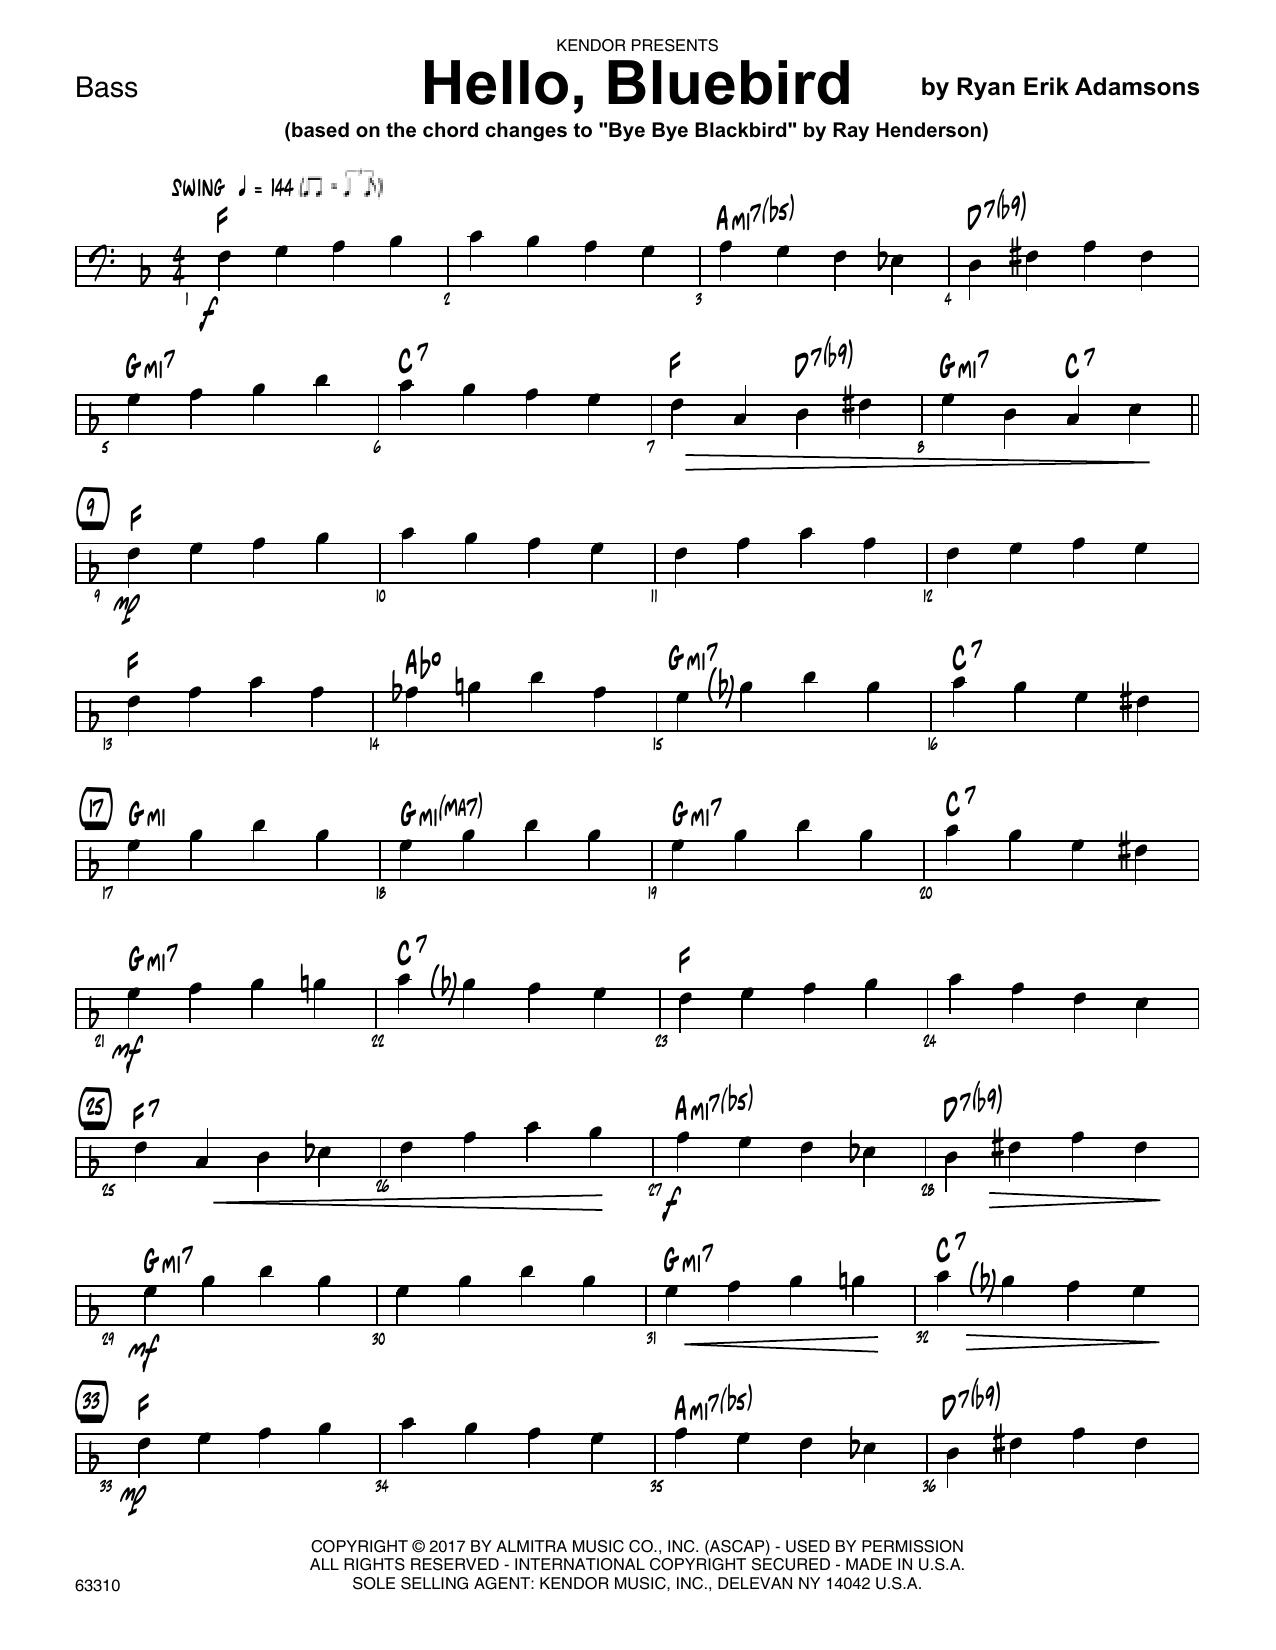 Ryan Erik Adamsons Hello, Bluebird (based on Bye Bye Blackbird) - Bass sheet music notes printable PDF score